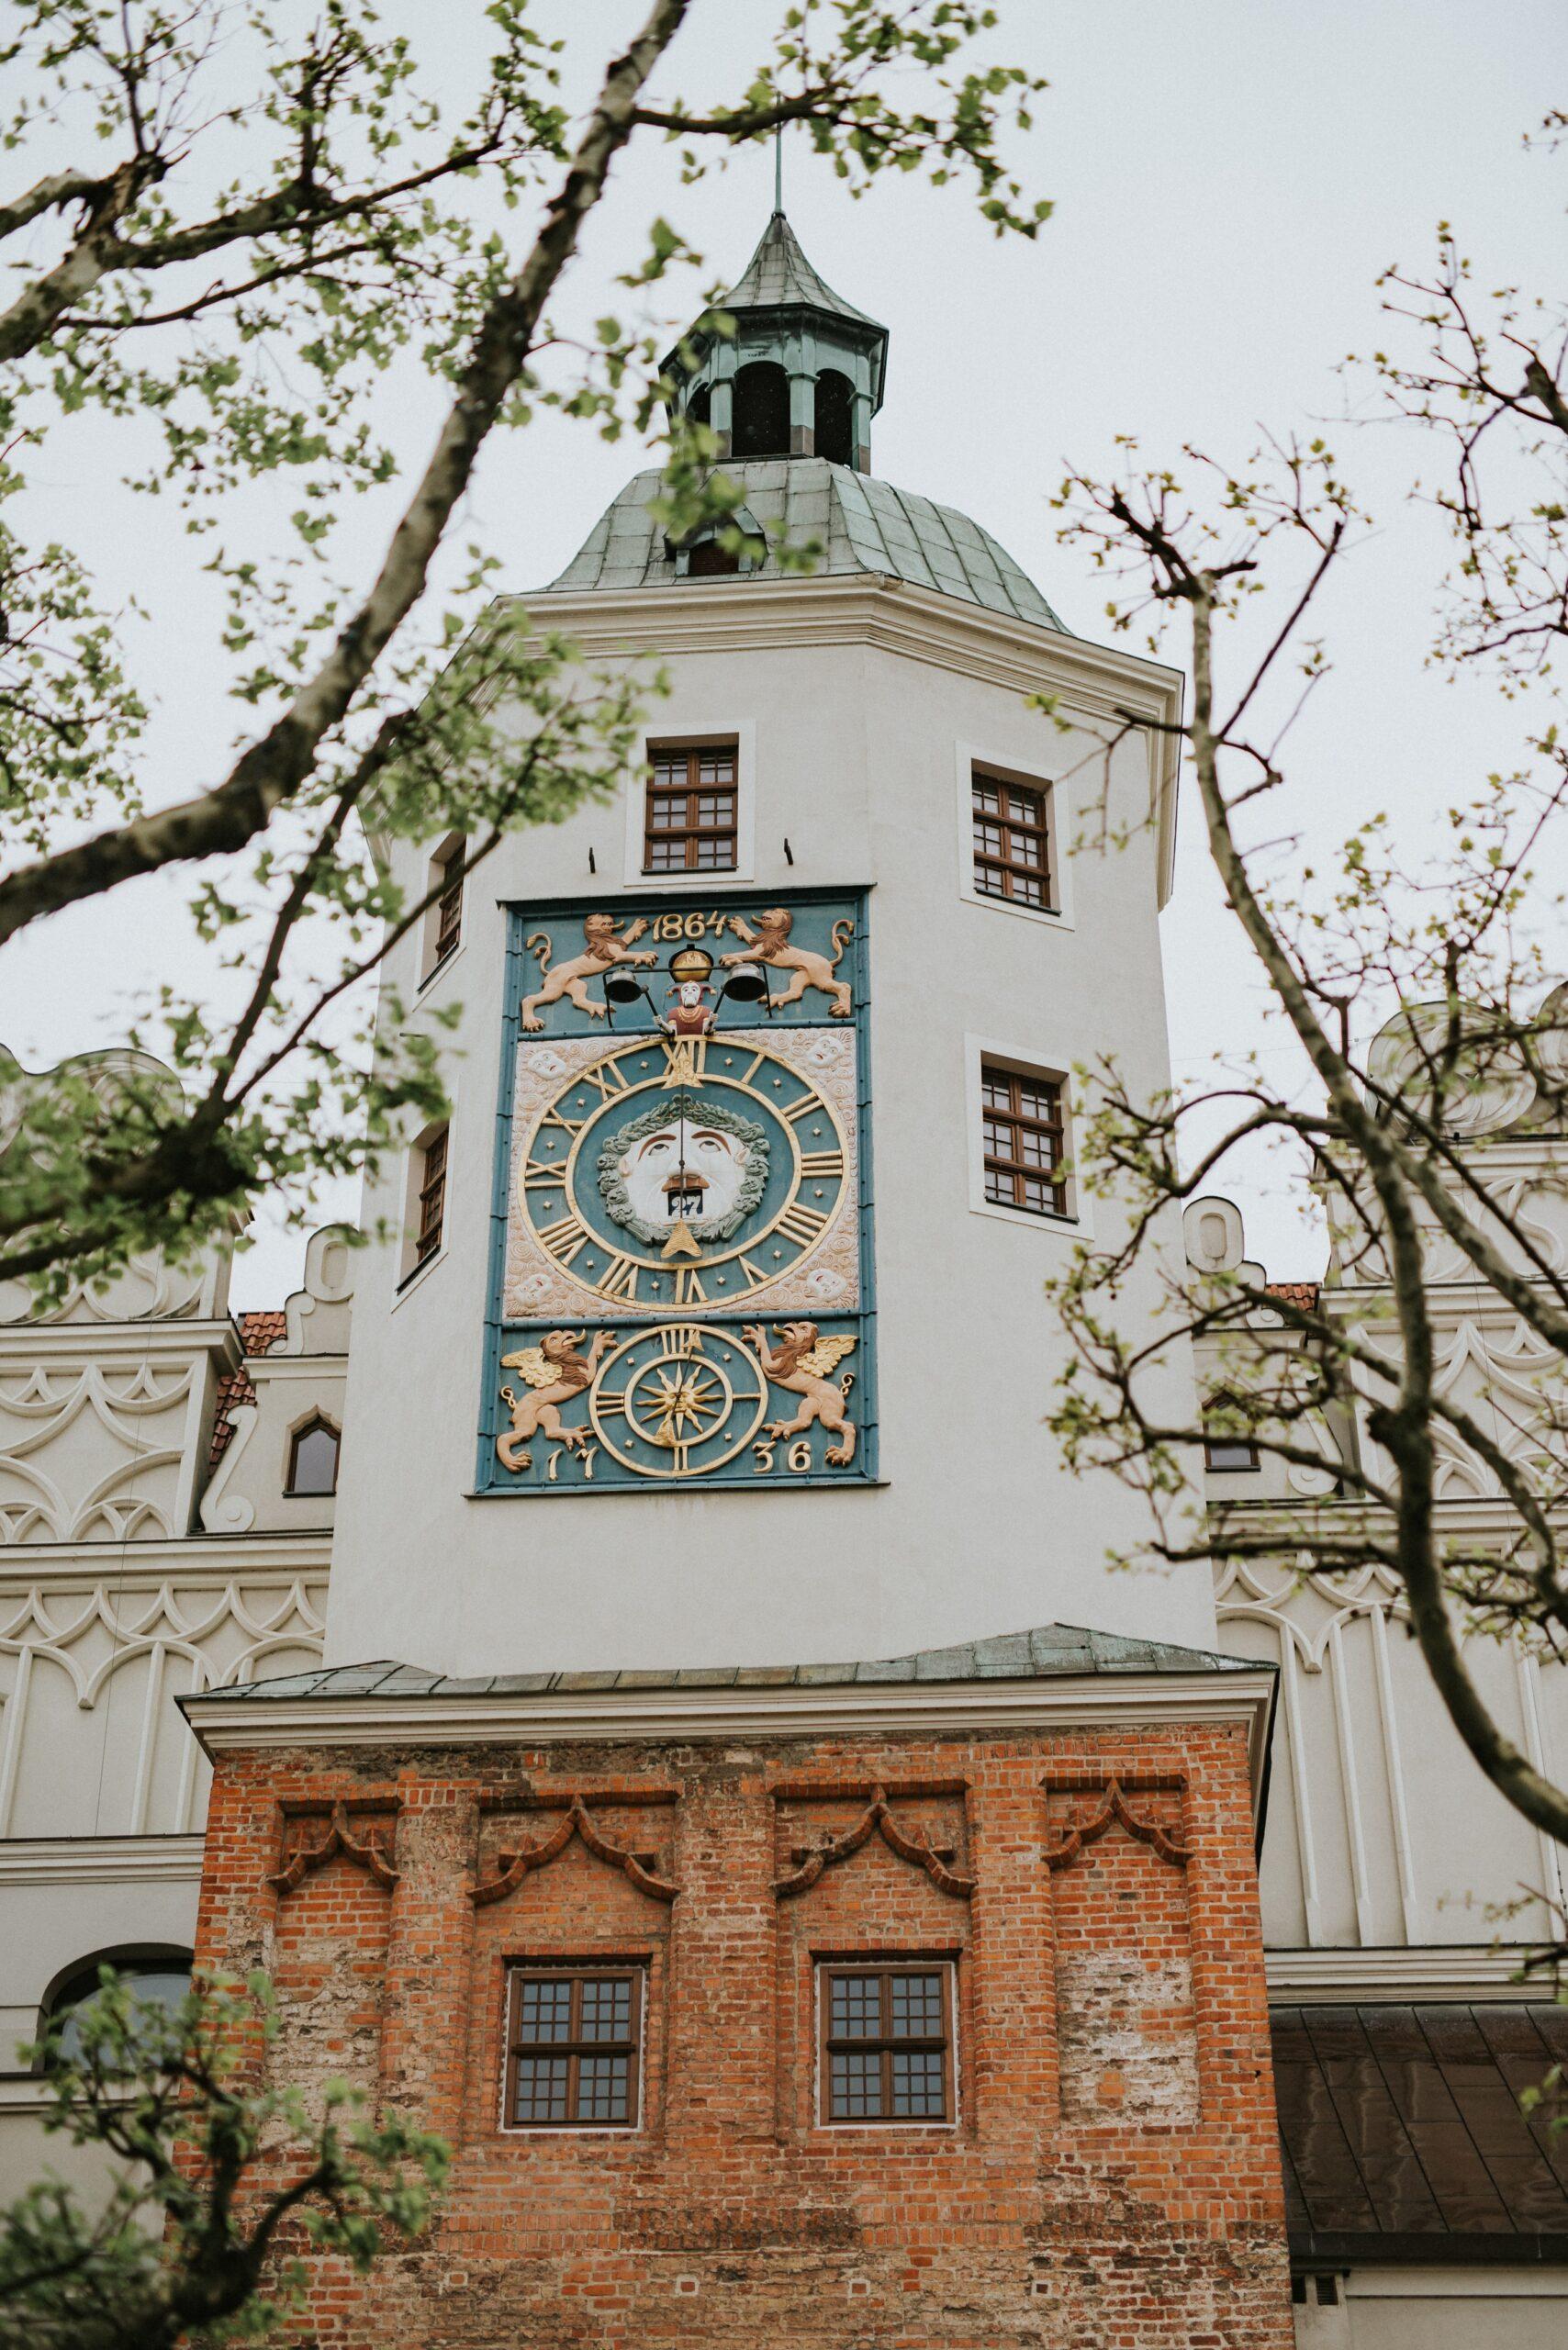 Qué visitar en Polonia - Szczecin